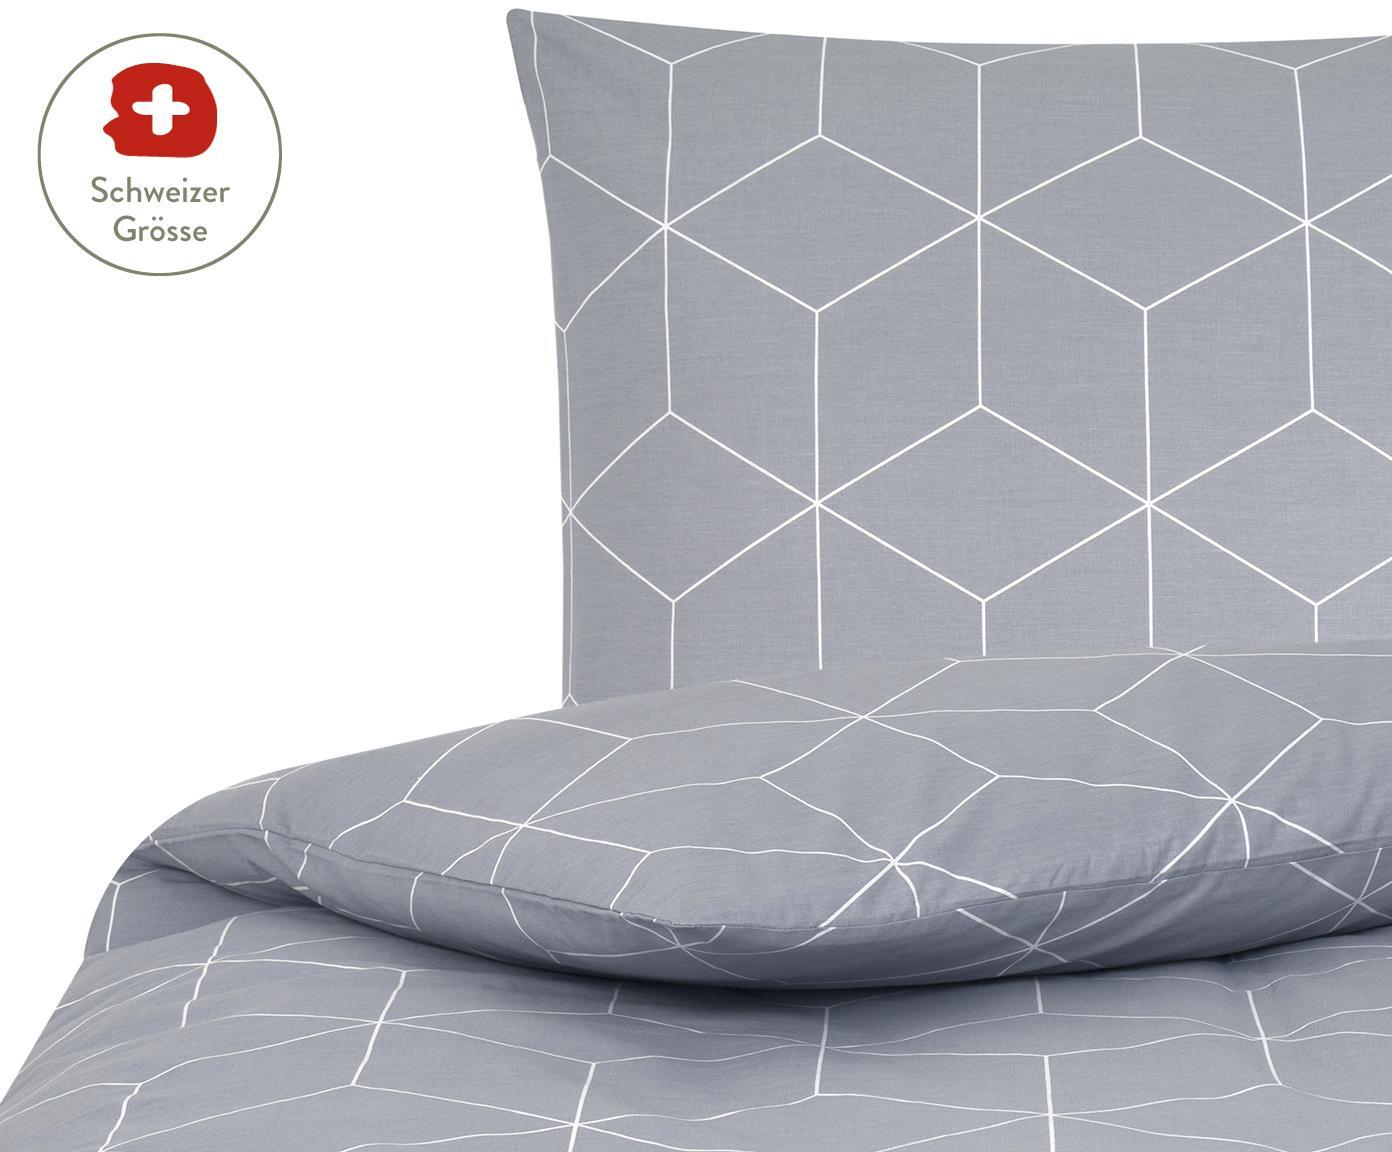 Baumwoll-Bettdeckenbezug Lynn mit grafischem Muster, Webart: Renforcé Fadendichte 144 , Grau, Cremeweiss, 160 x 210 cm